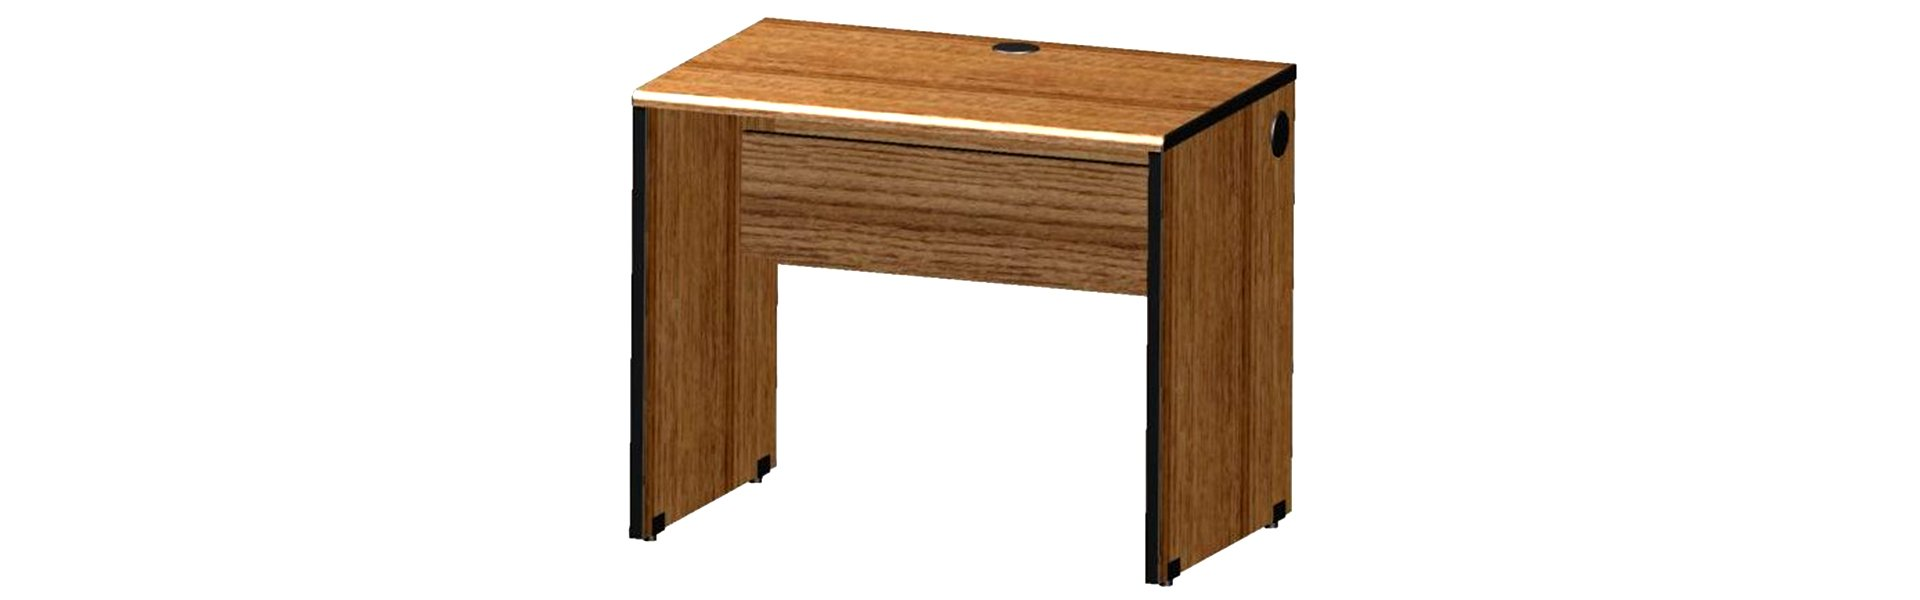 CFC Educational 4000 Series Desk Feature